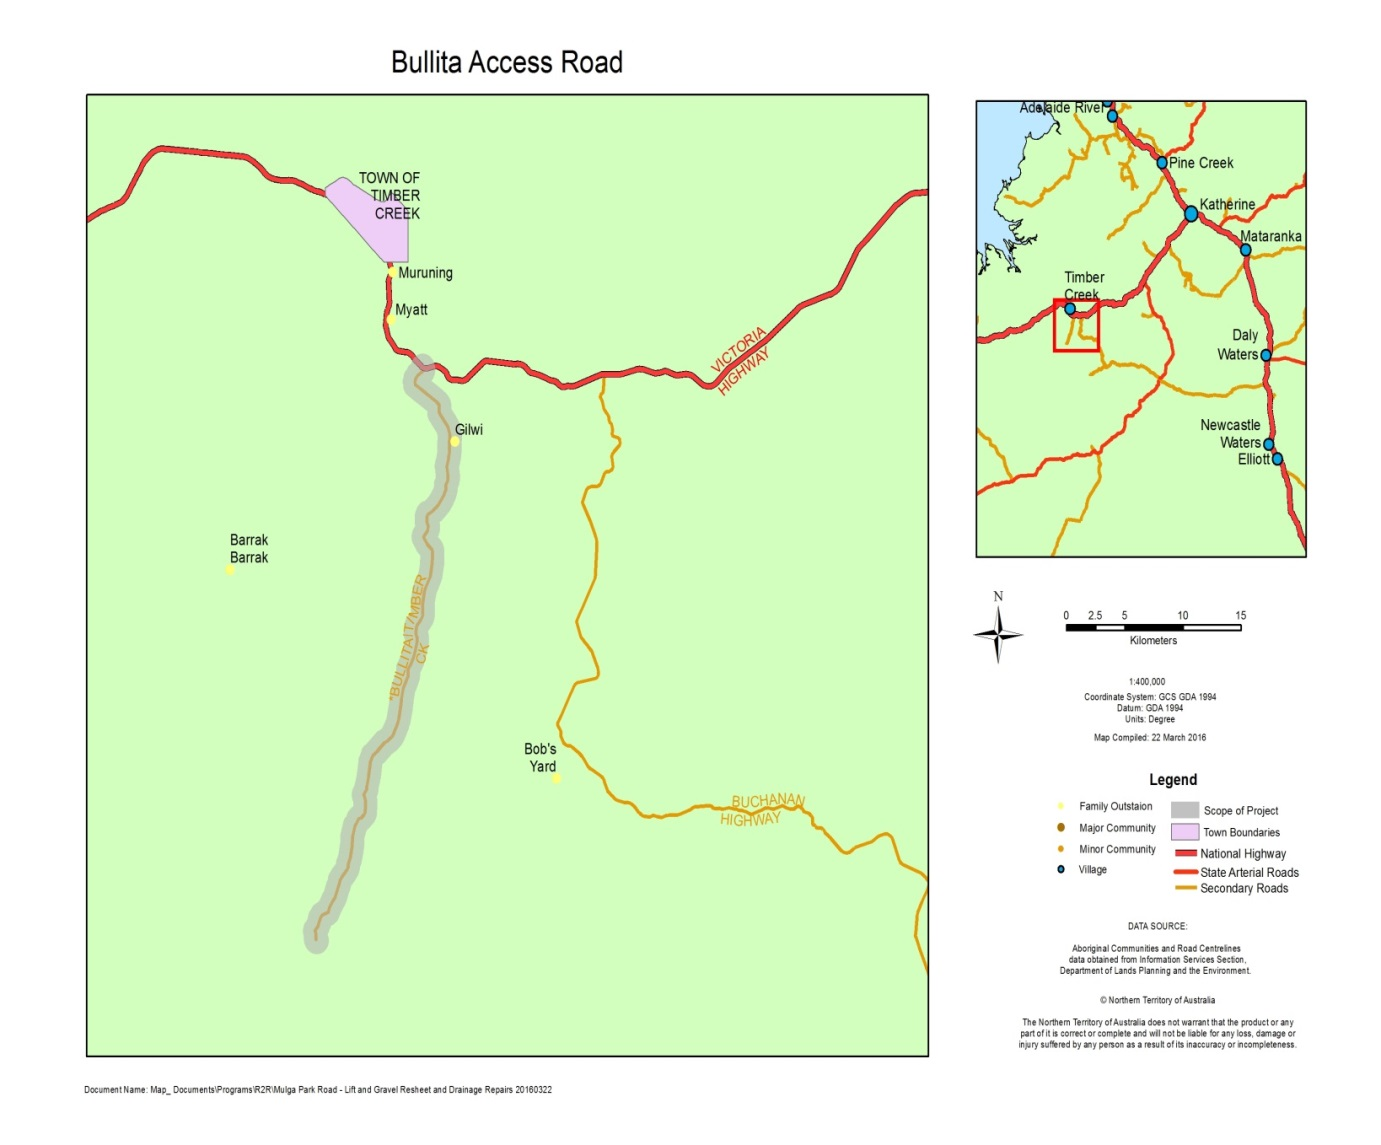 Upgrades to Bullita Access Road